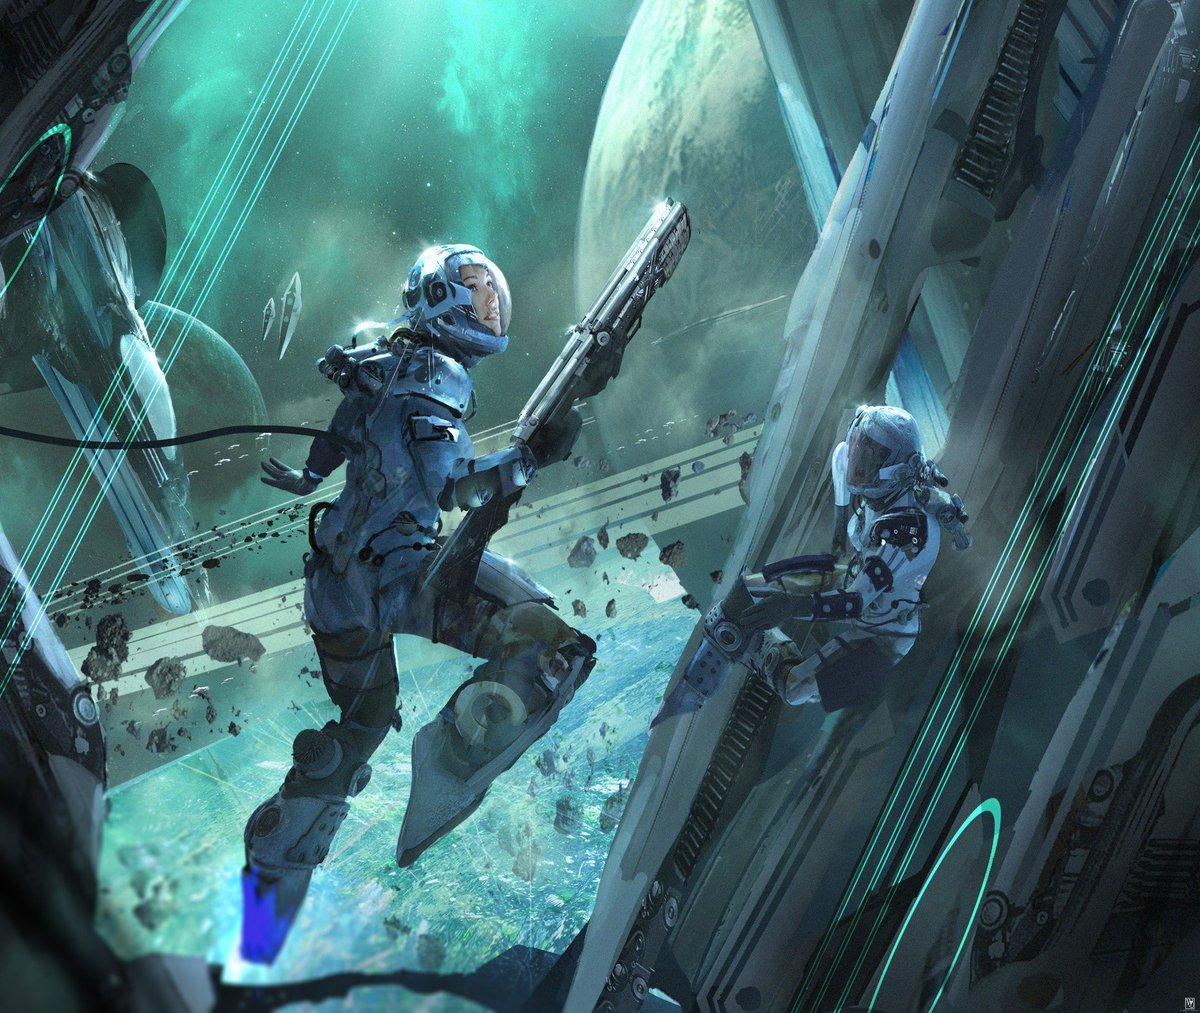 sci fi art - HD1920×1620